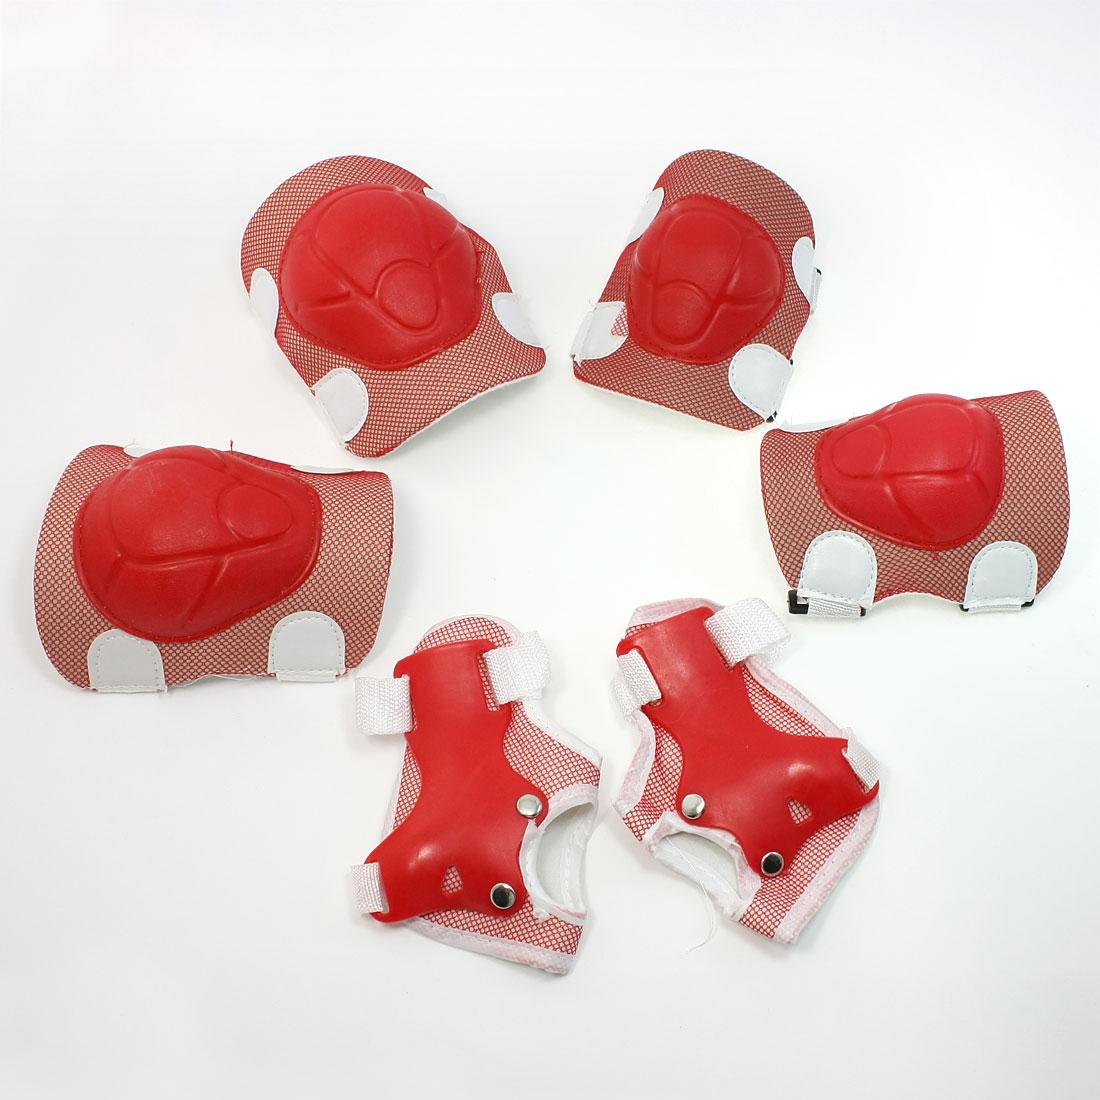 Adjustable Hook Loop Fastener Knee Elbow Palm Sport Support Set Red White